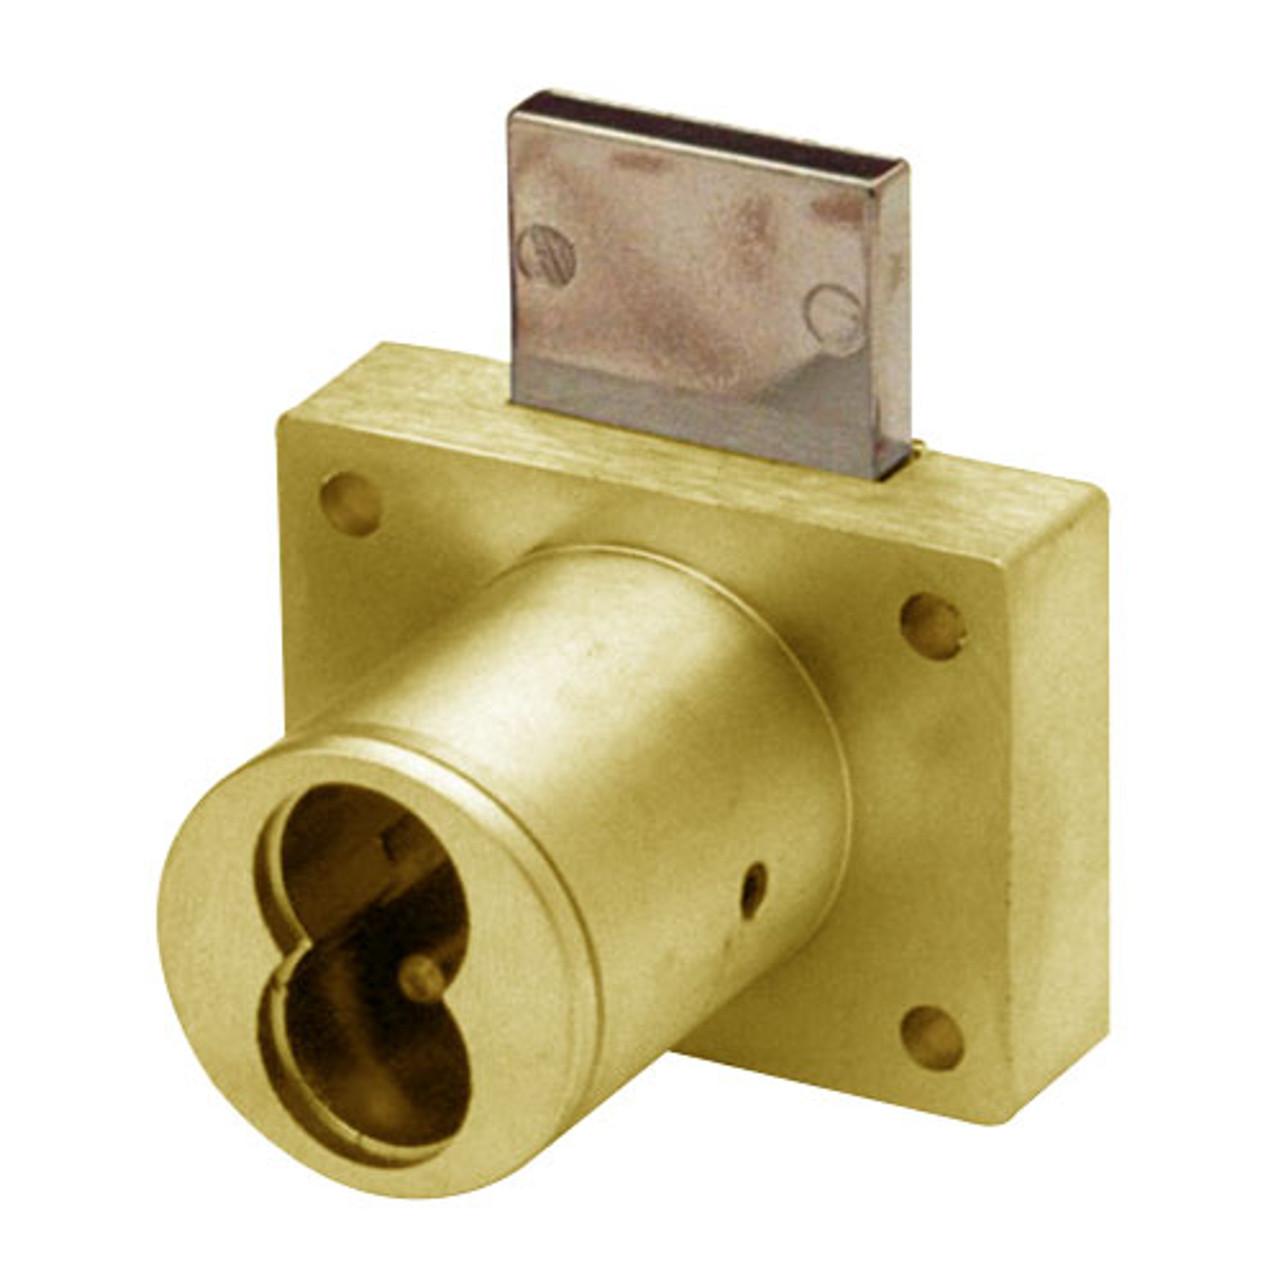 Olympus 721DW-US3 Cabinet Drawer Lock in Bright Brass Finish